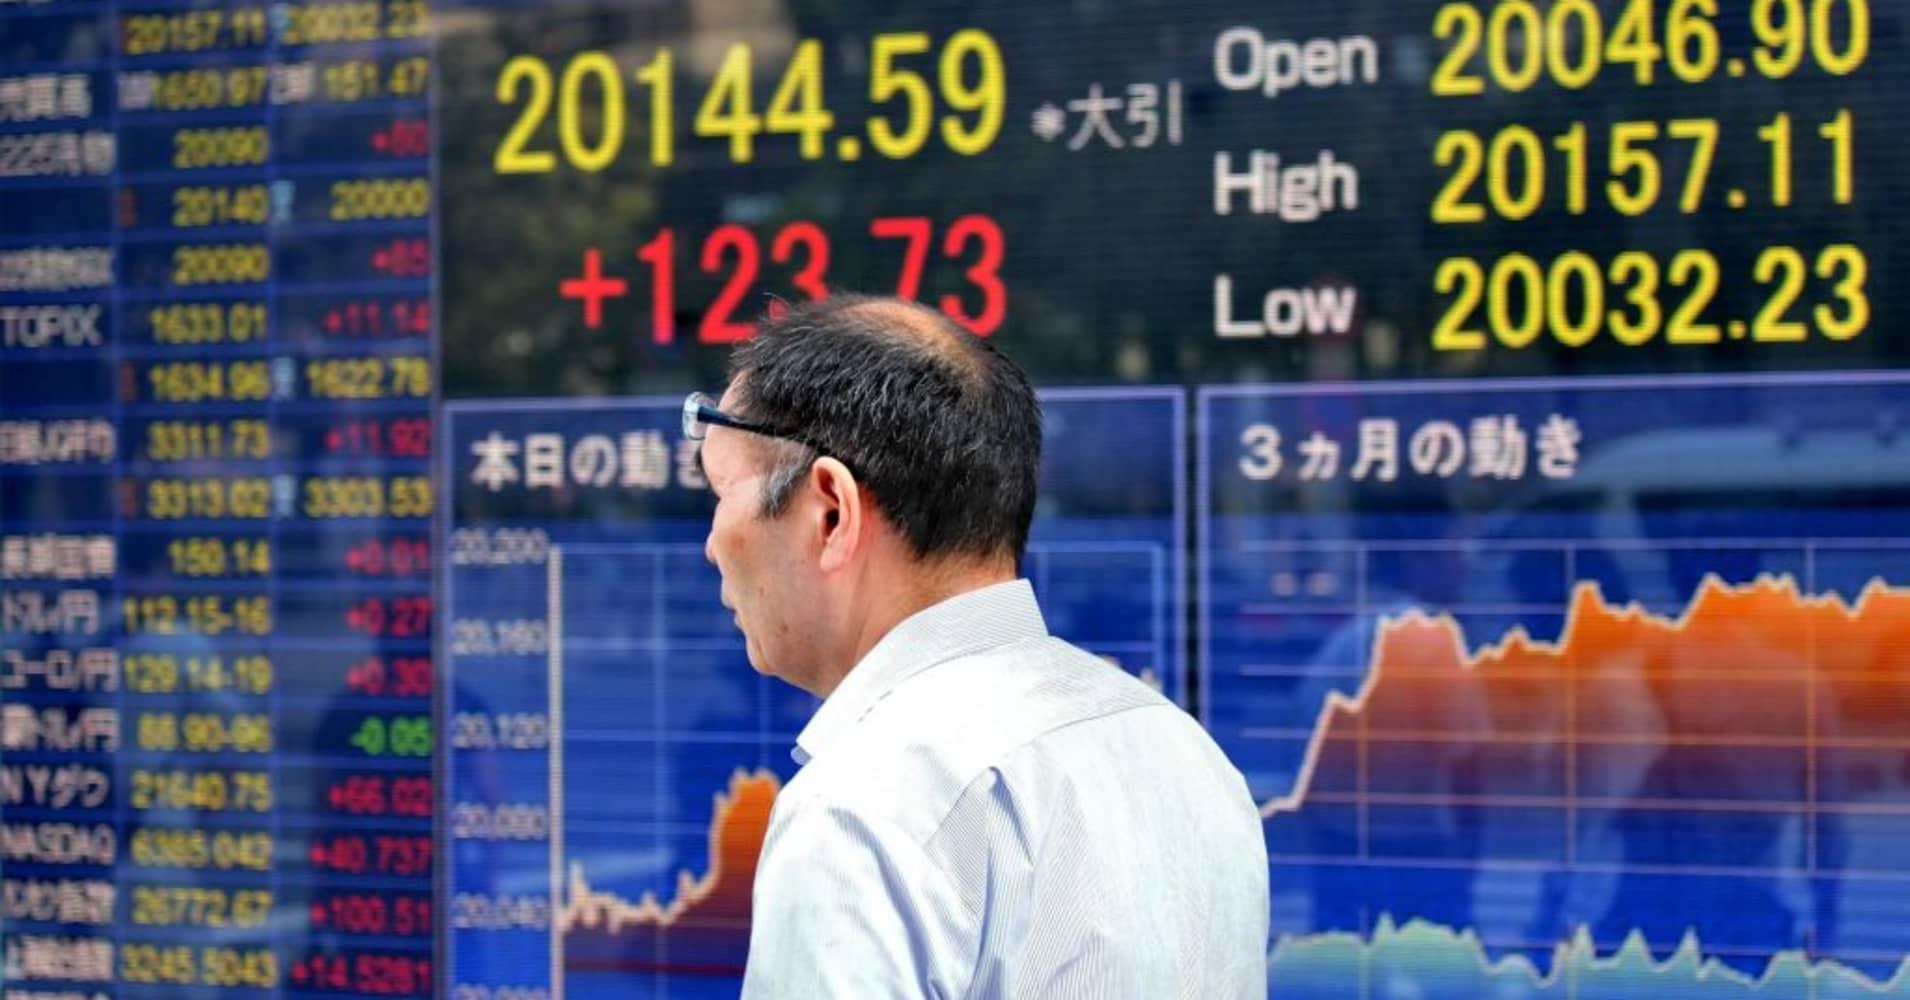 US dollar and FOMC meeting in focus